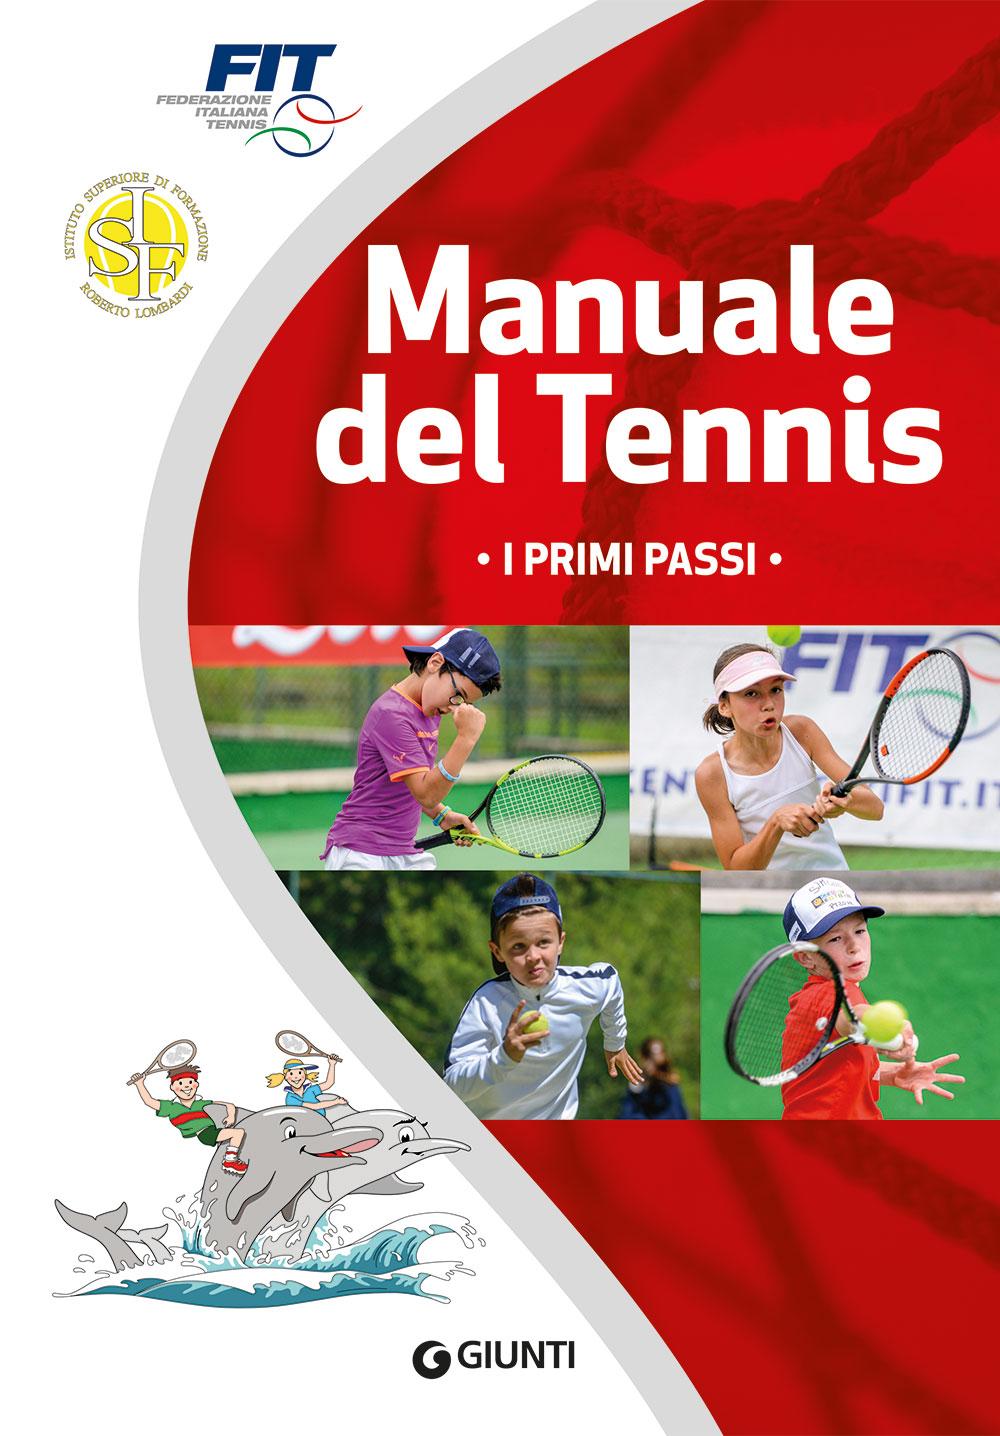 Manuale del tennis